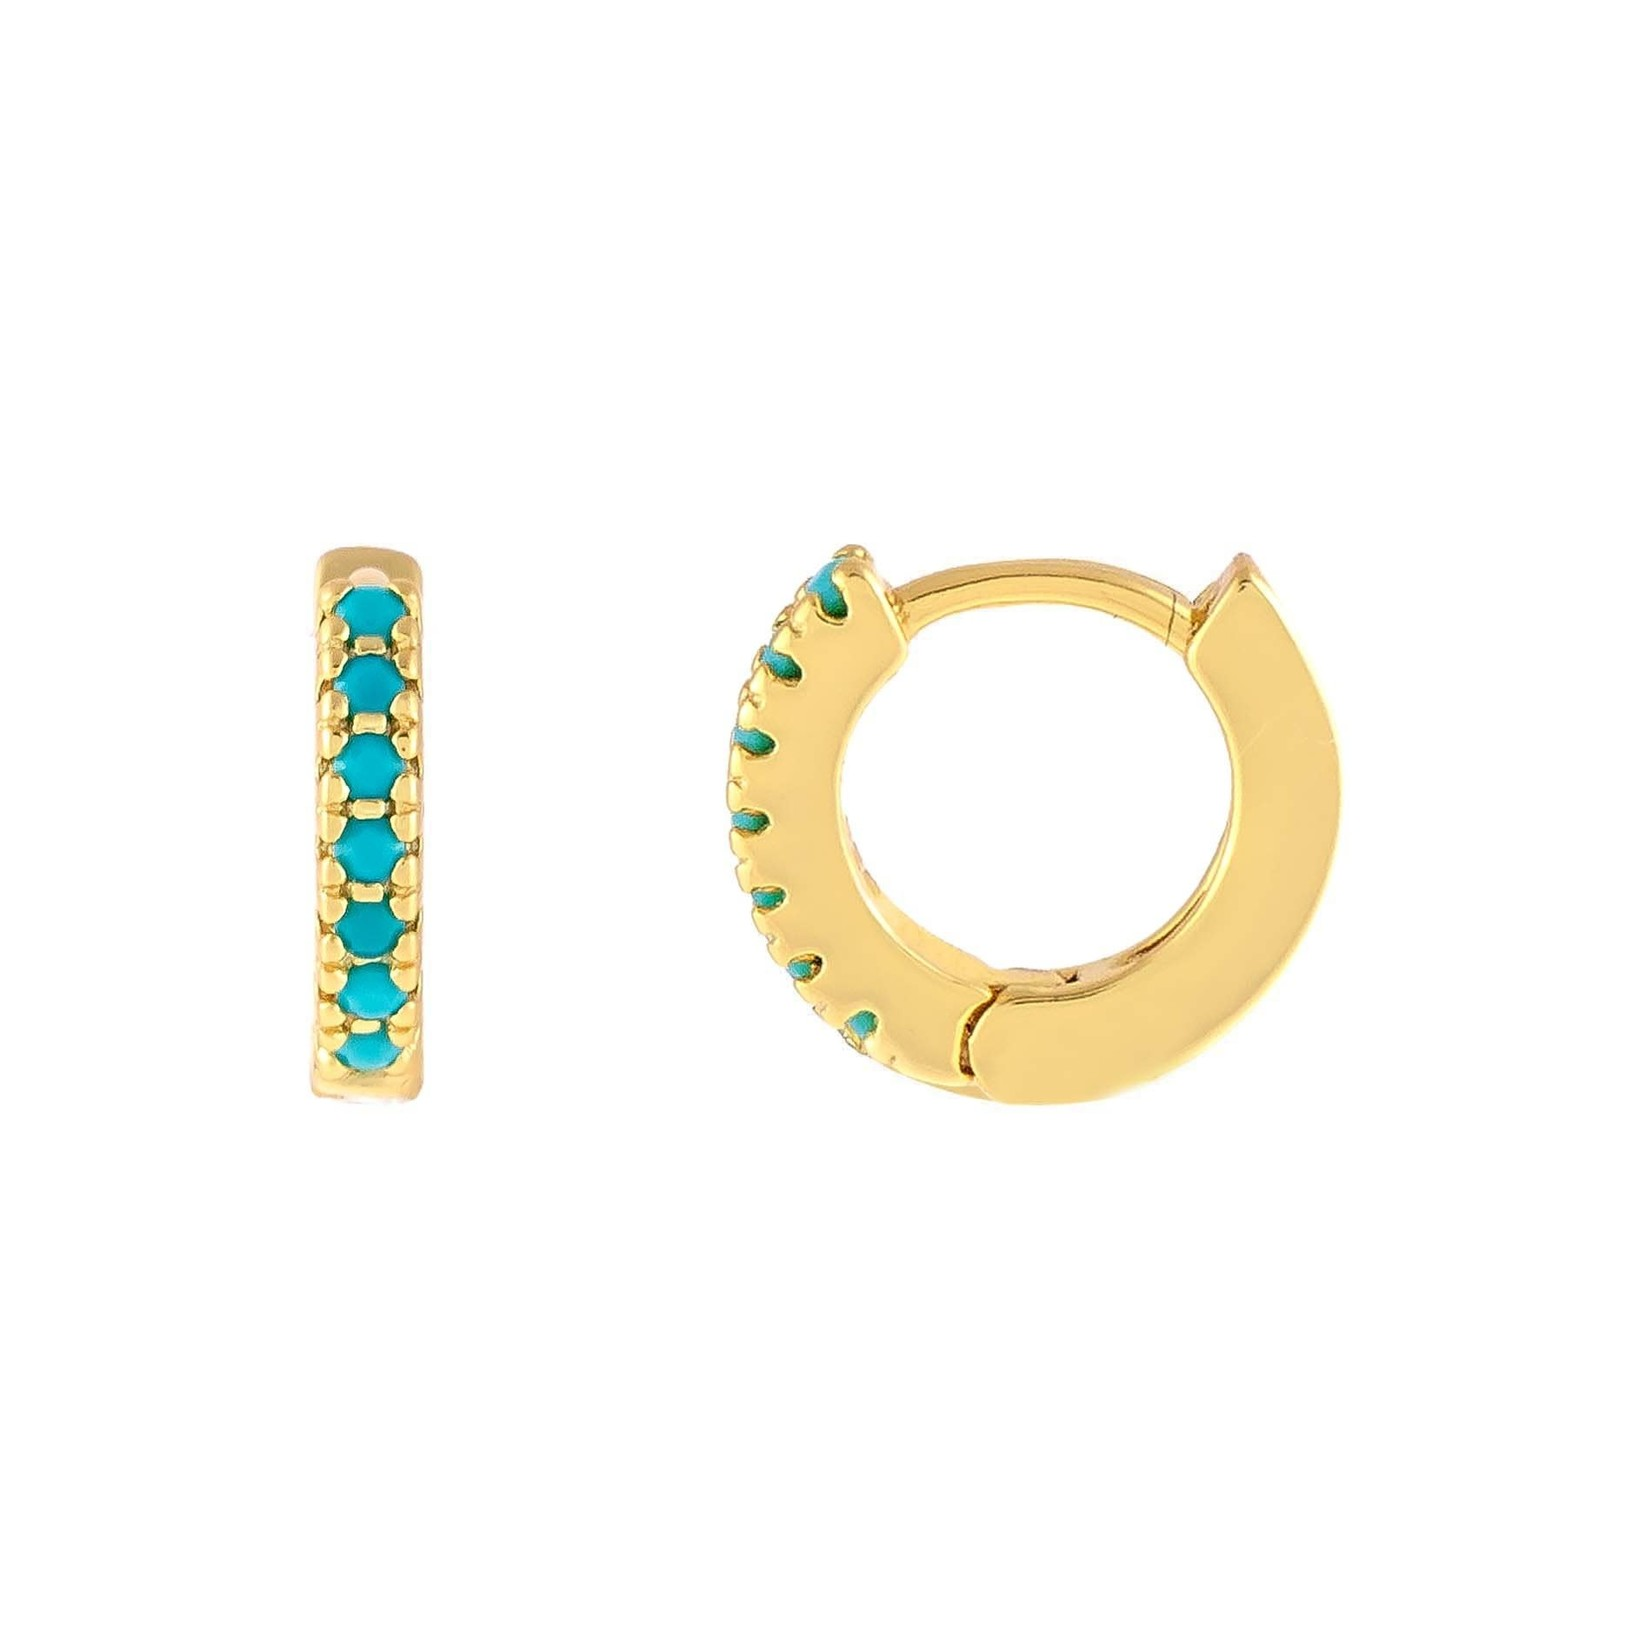 Adinas CZ Turqoise Huggie Earrings